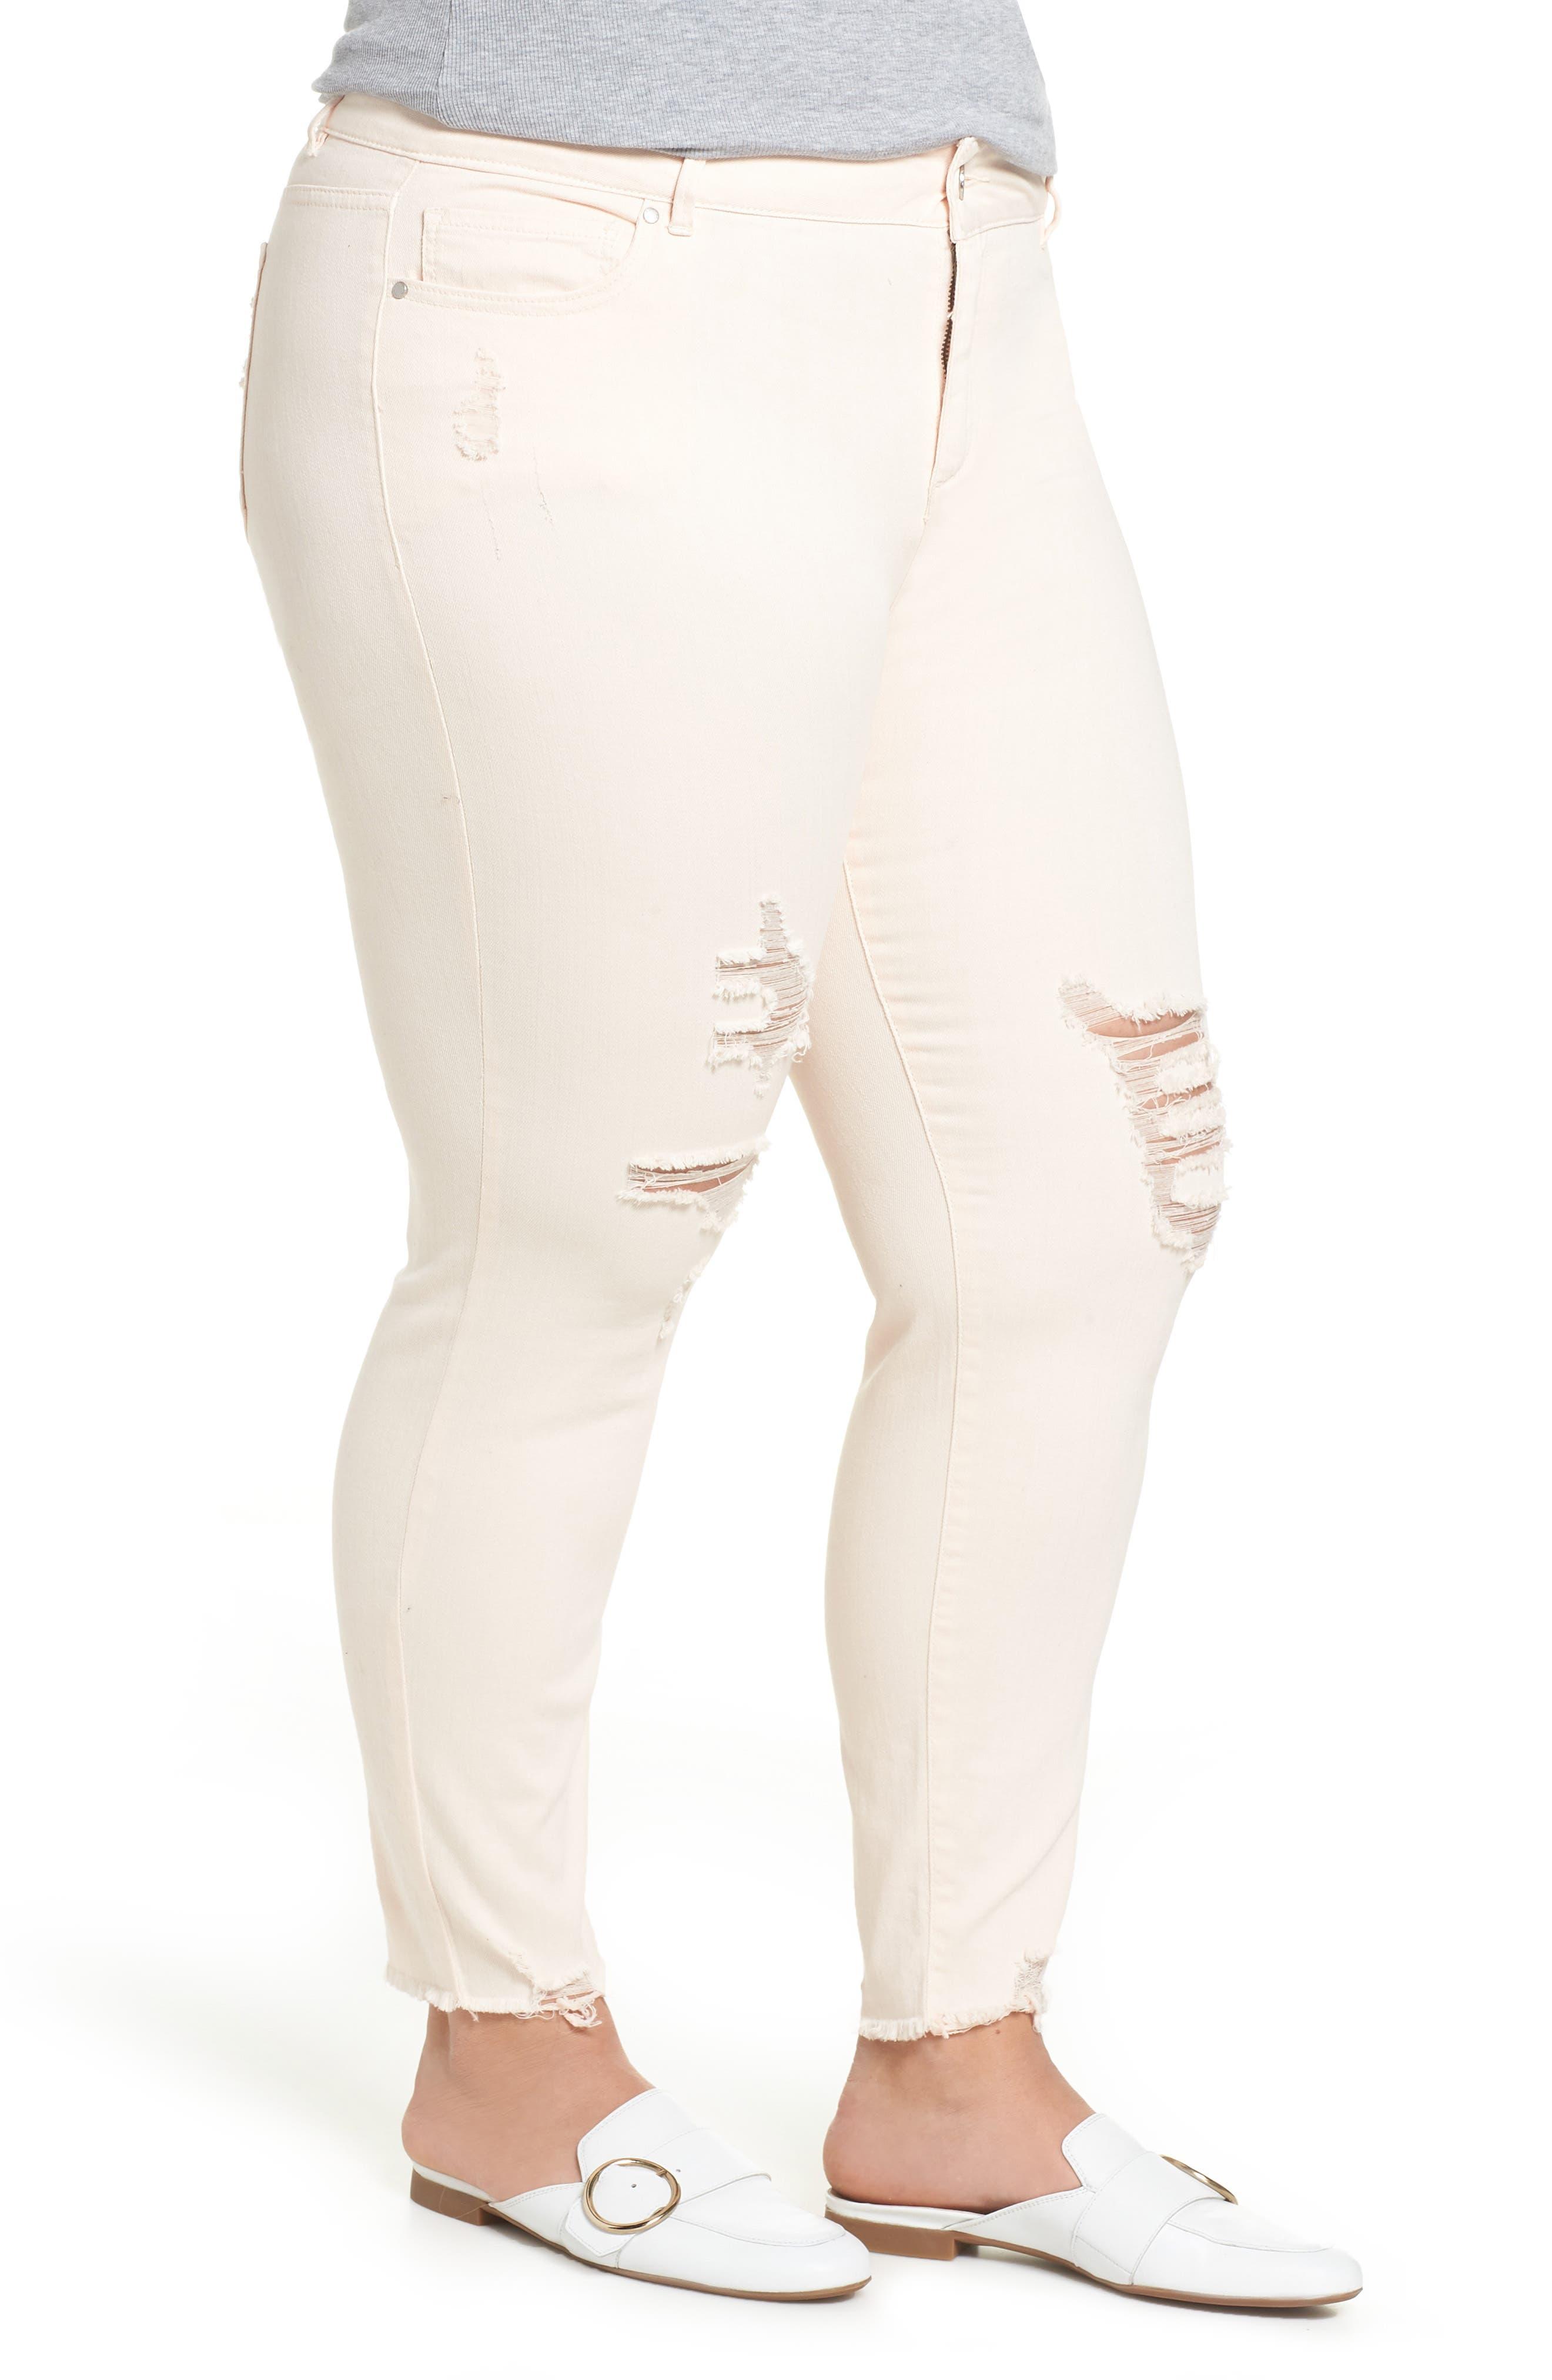 RACHEL RACHEL ROY,                             Icon Distressed Skinny Jeans,                             Alternate thumbnail 3, color,                             680